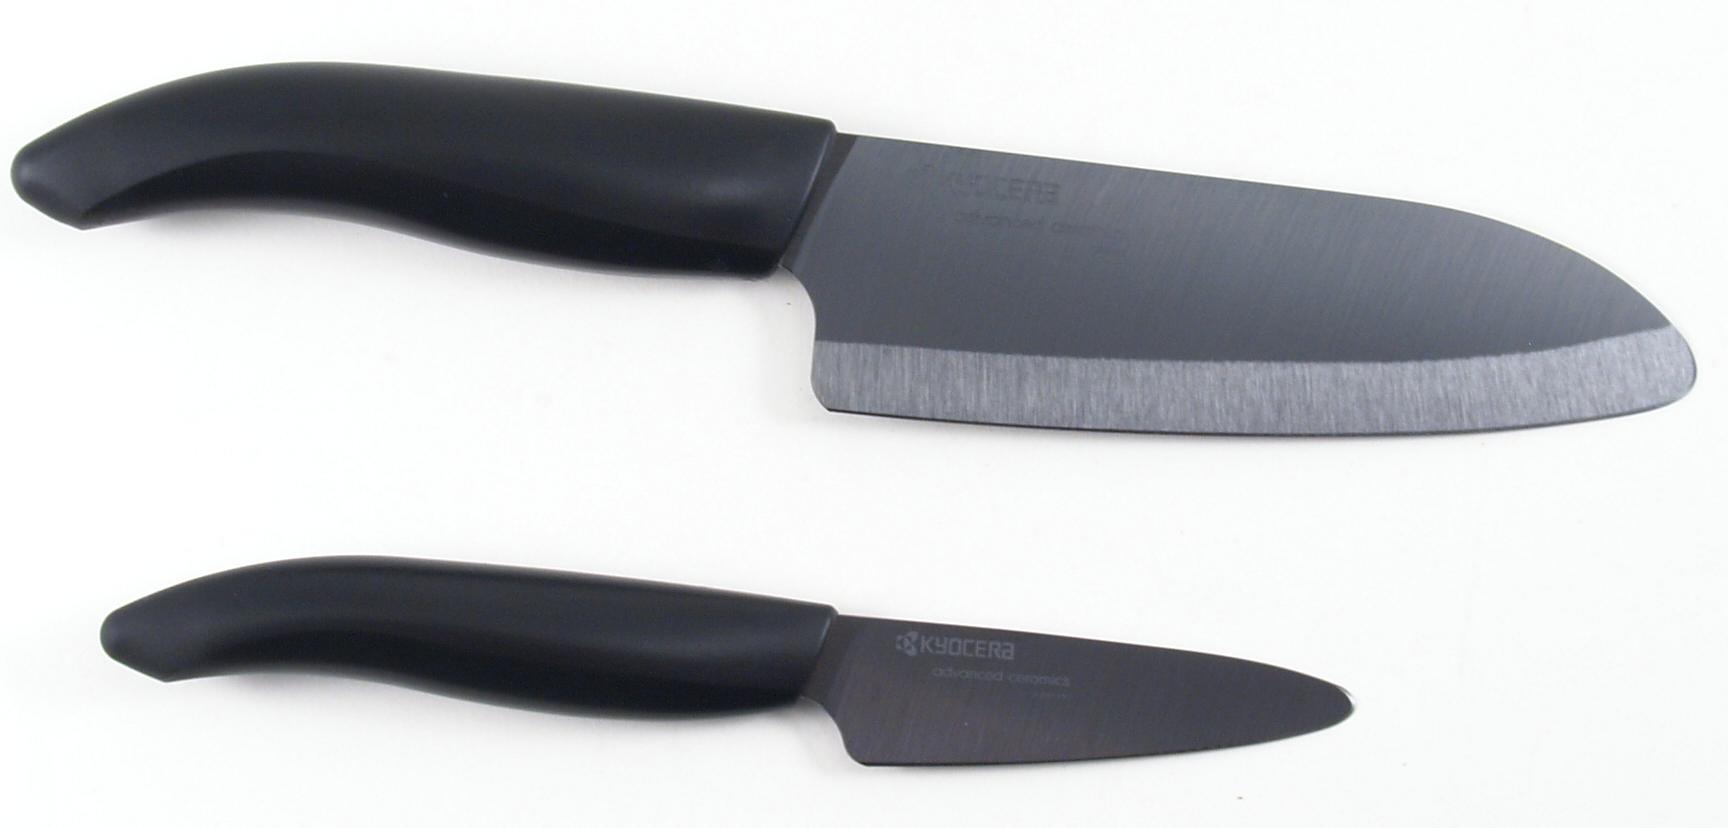 Kyocera Revolution Black Ceramic Paring Knife and Santoku Knife Set